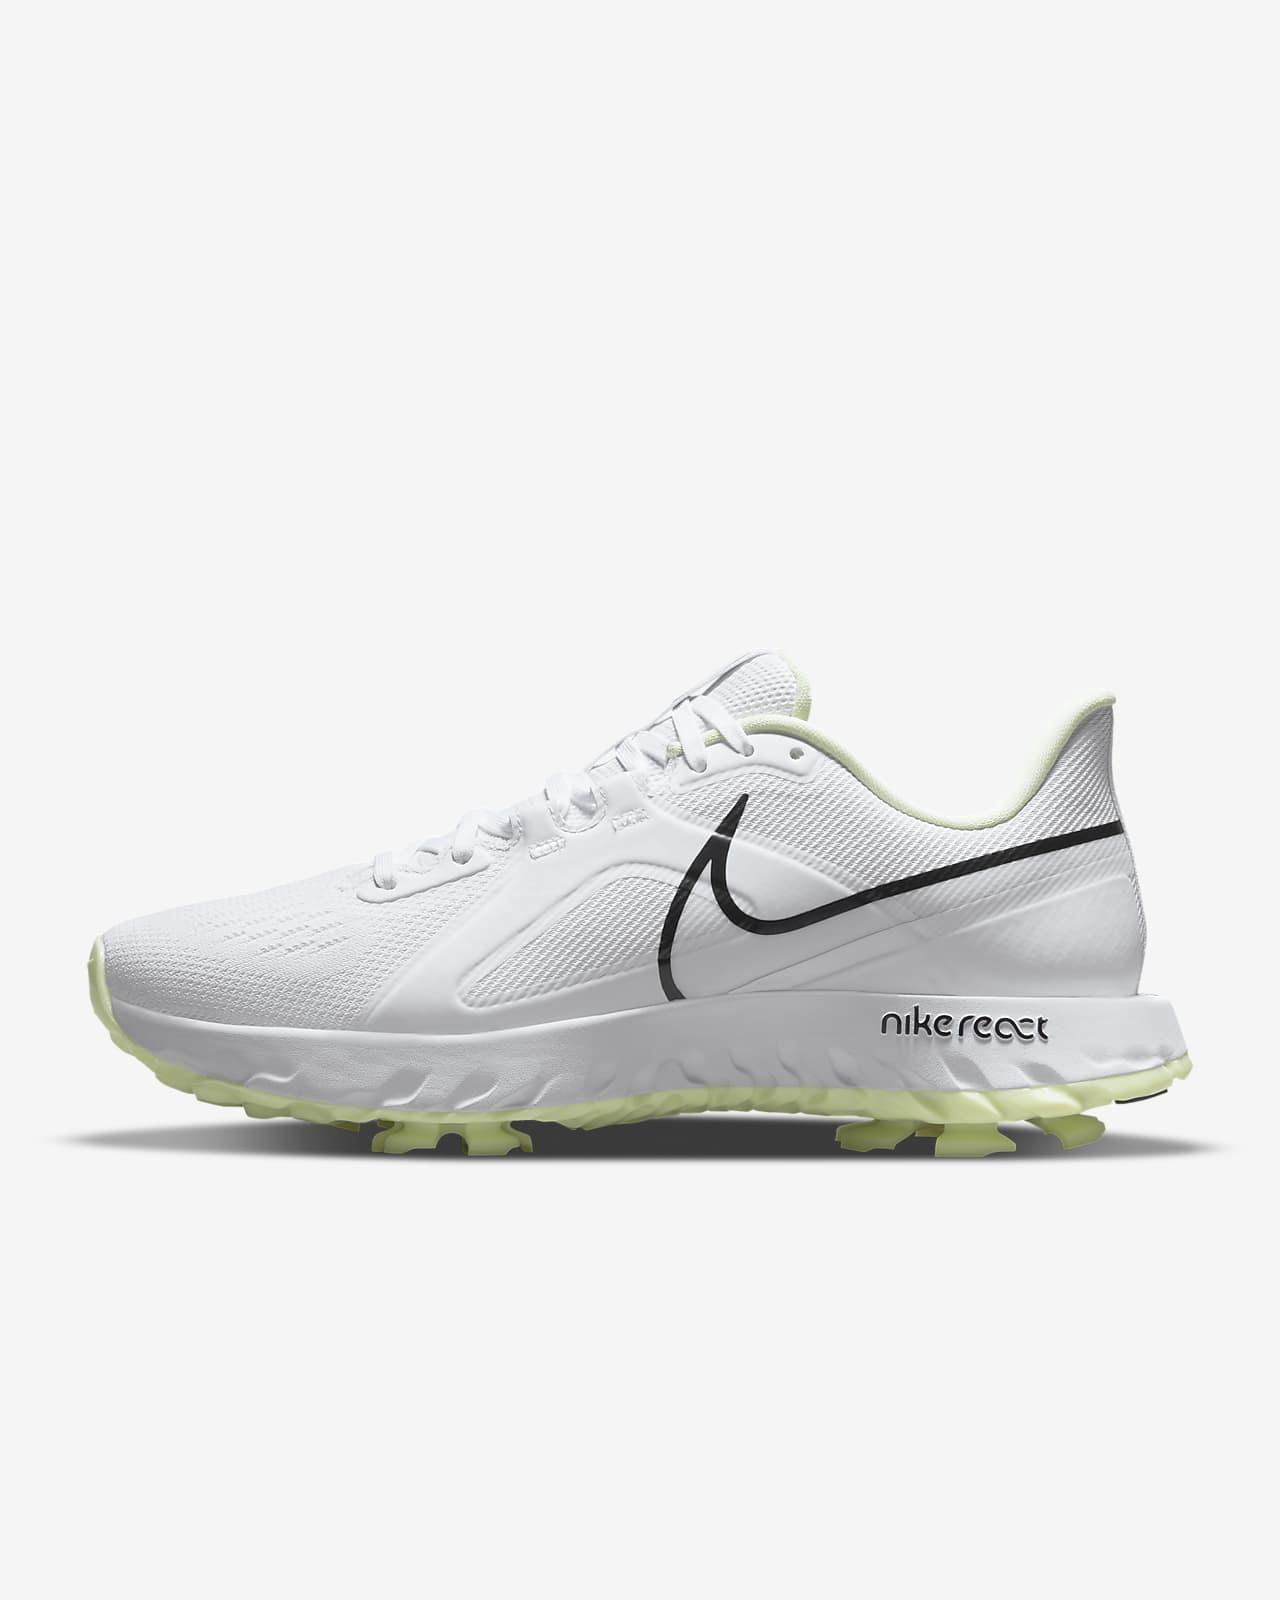 Nike React Infinity Pro Golf Shoe. Nike LU